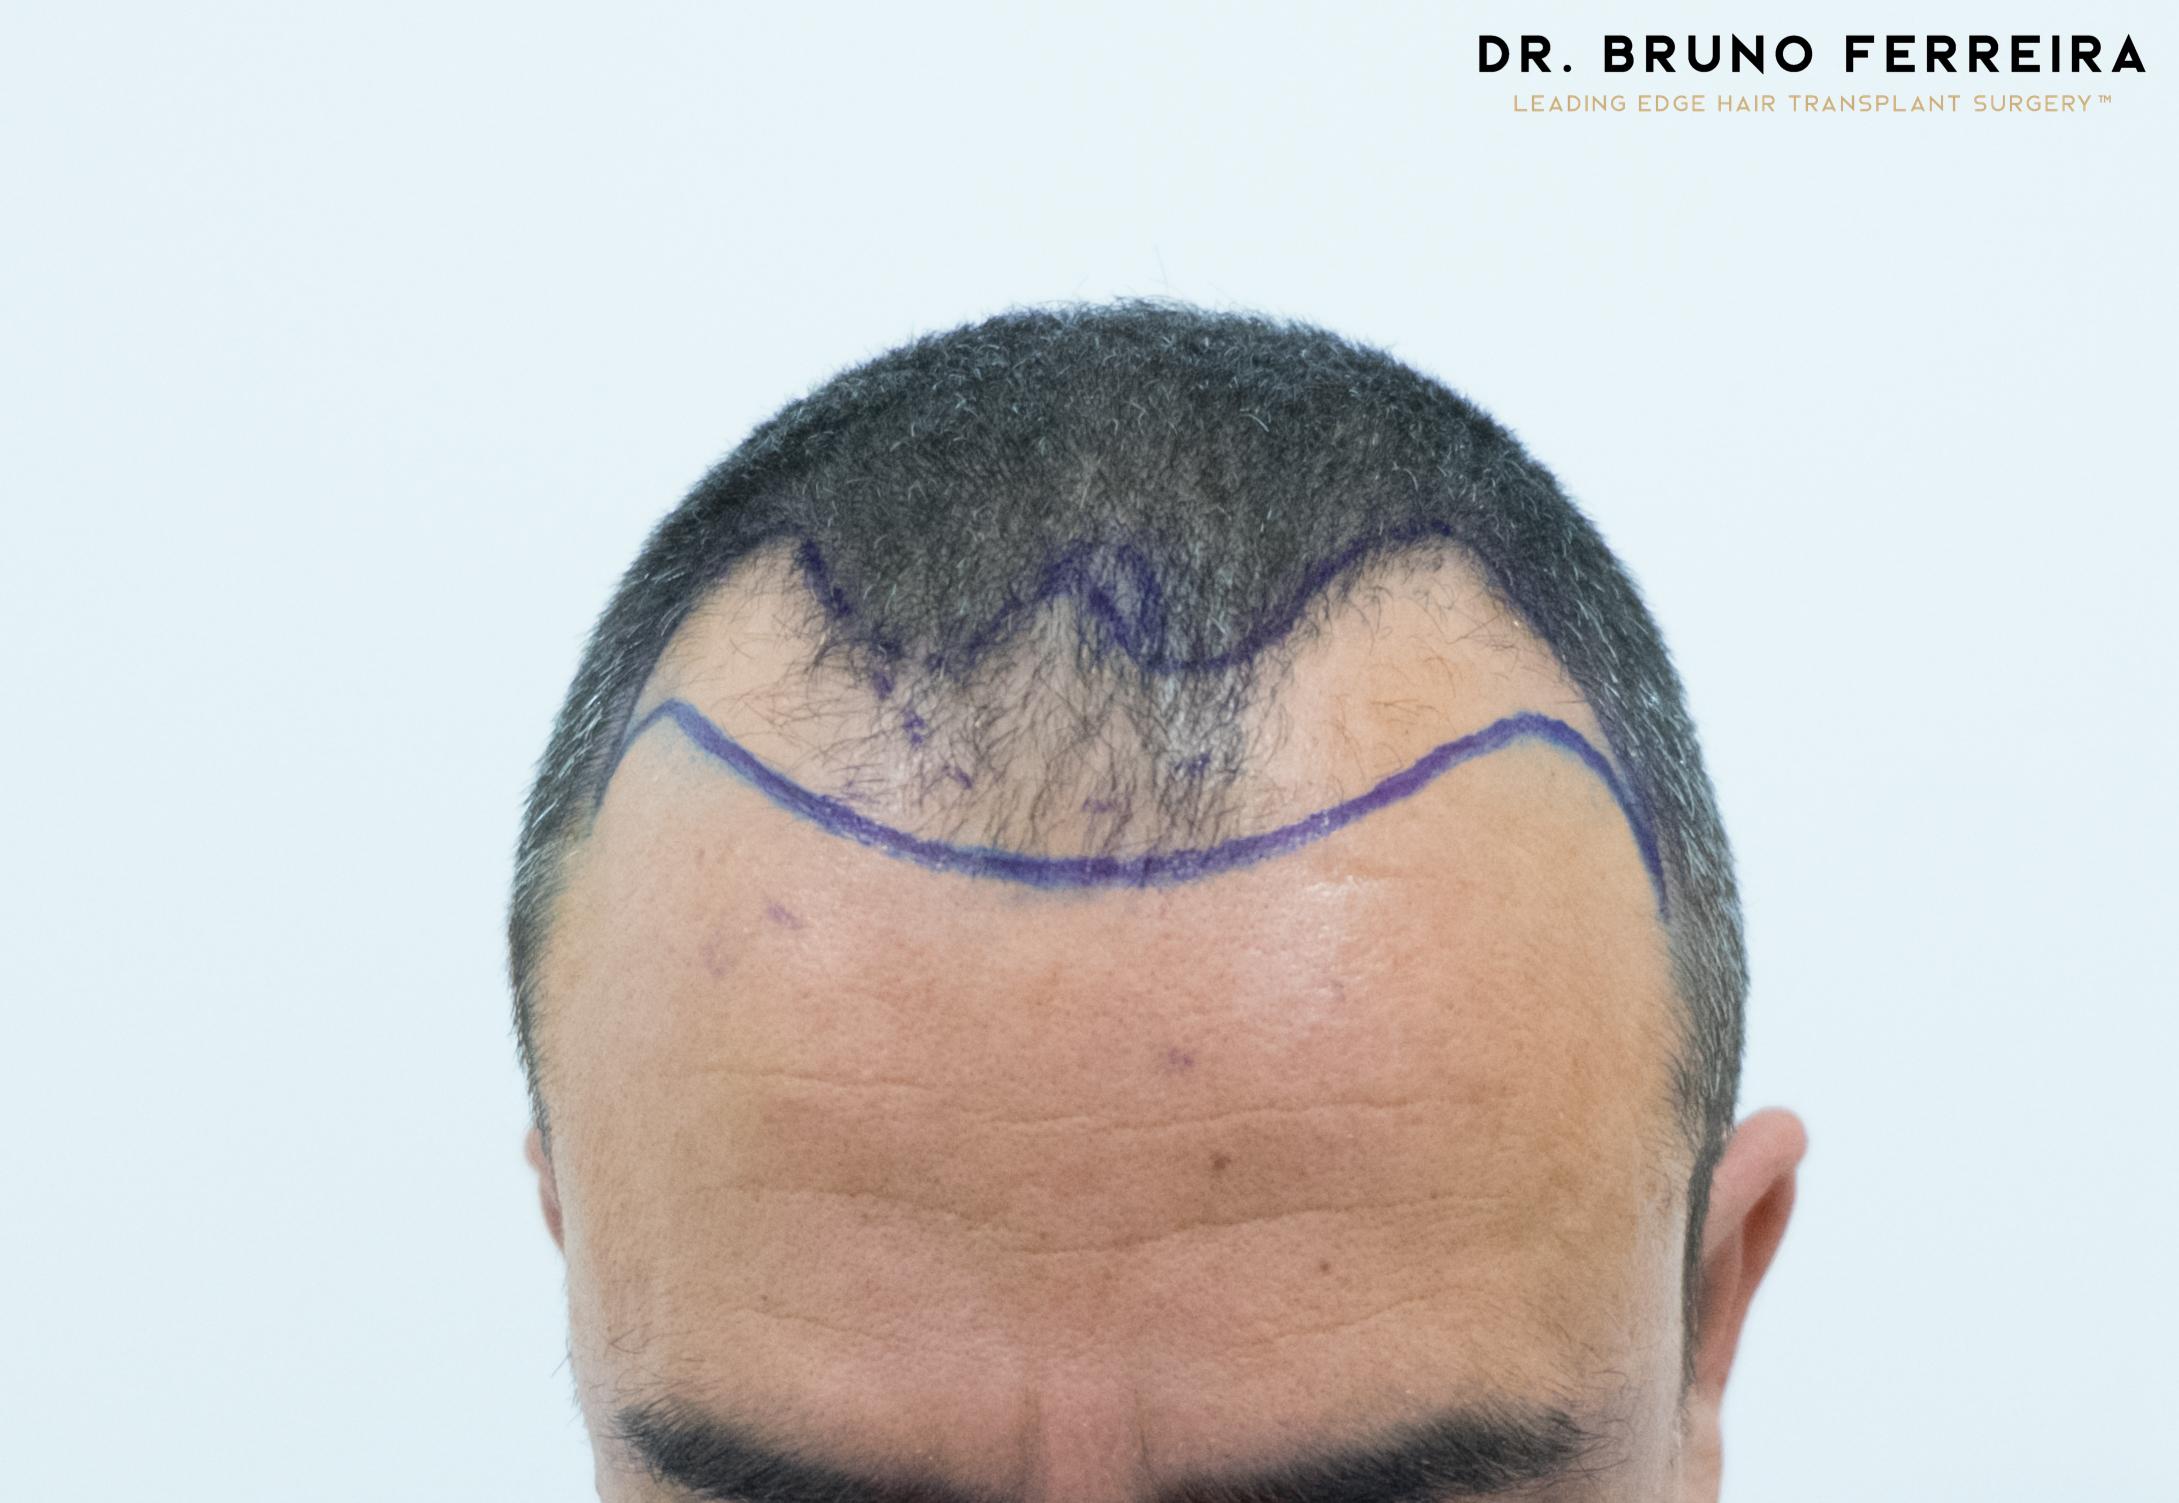 00003 DR. BRUNO FERREIRA (Case 1) - Before - 4.jpg